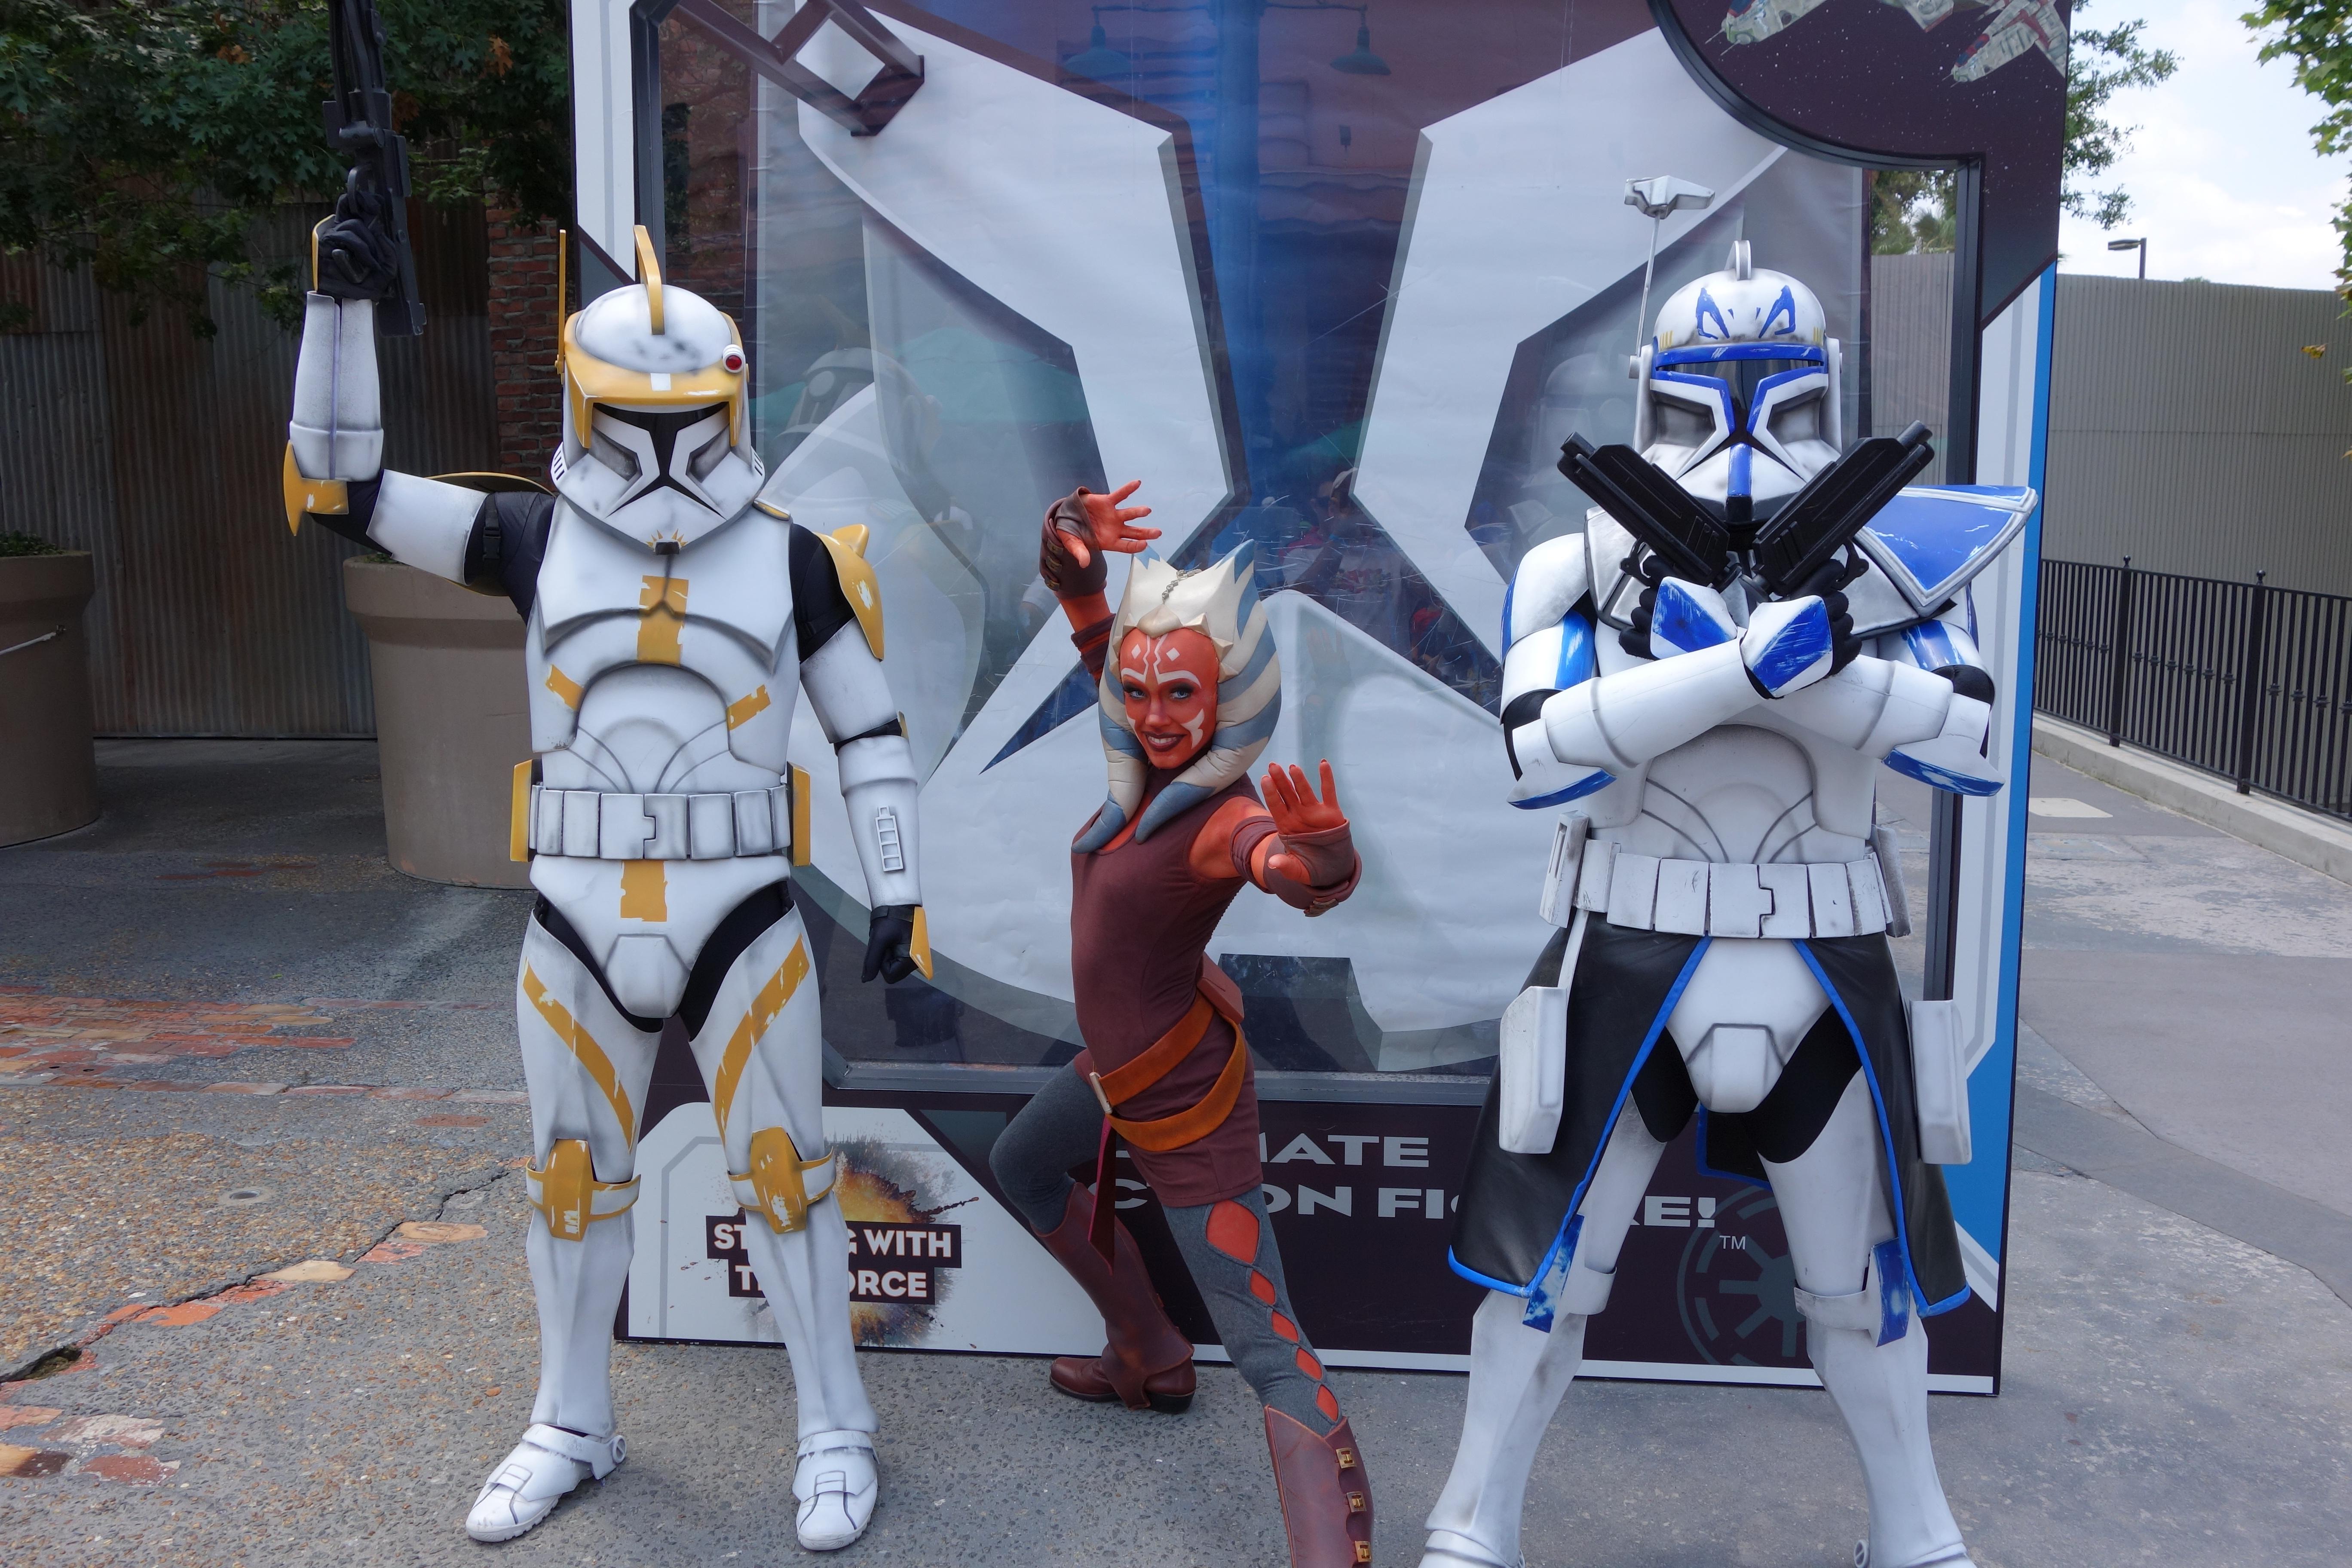 Ahsoka Tano Commander Cody Captain Rex Star Wars Weekends 2013 (1)  sc 1 st  KennythePirateu0027s Unofficial Guide to Disney World - WordPress.com & Ahsoka Tano Commander Cody Captain Rex Star Wars Weekends 2013 (1 ...